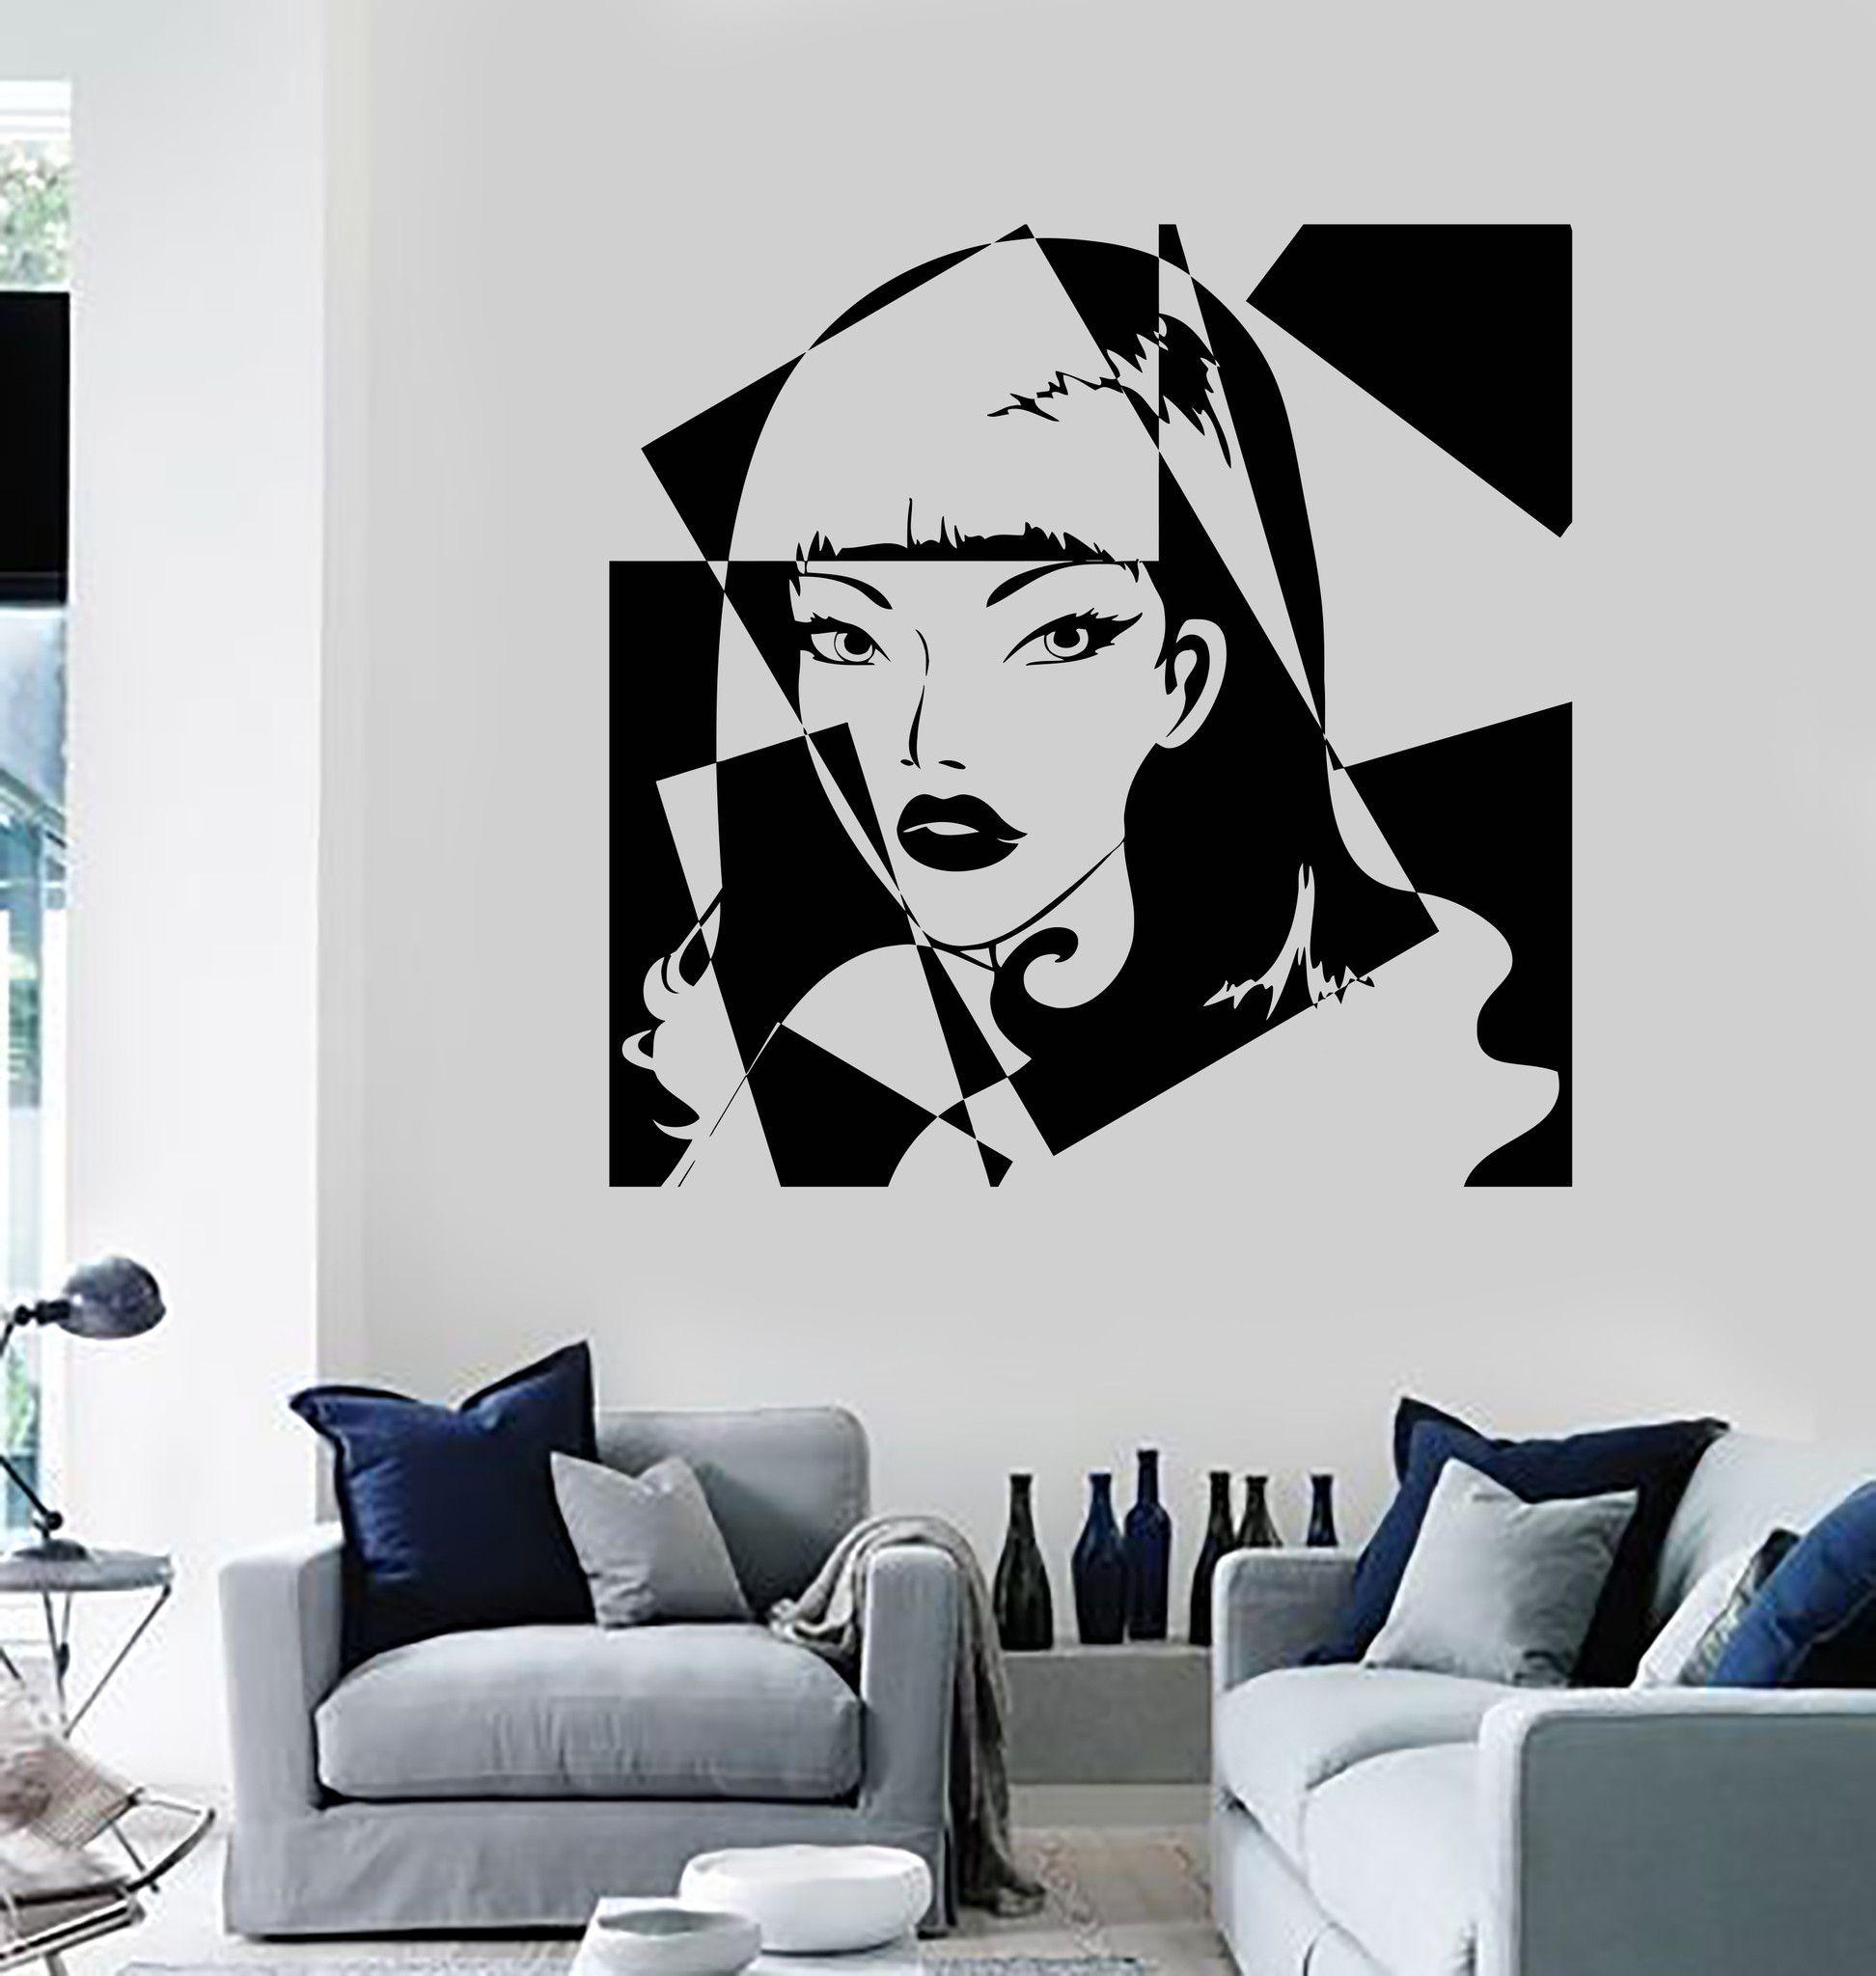 Vinyl Wall Decal Pop Art Girl Beauty Salon Woman Stickers Unique